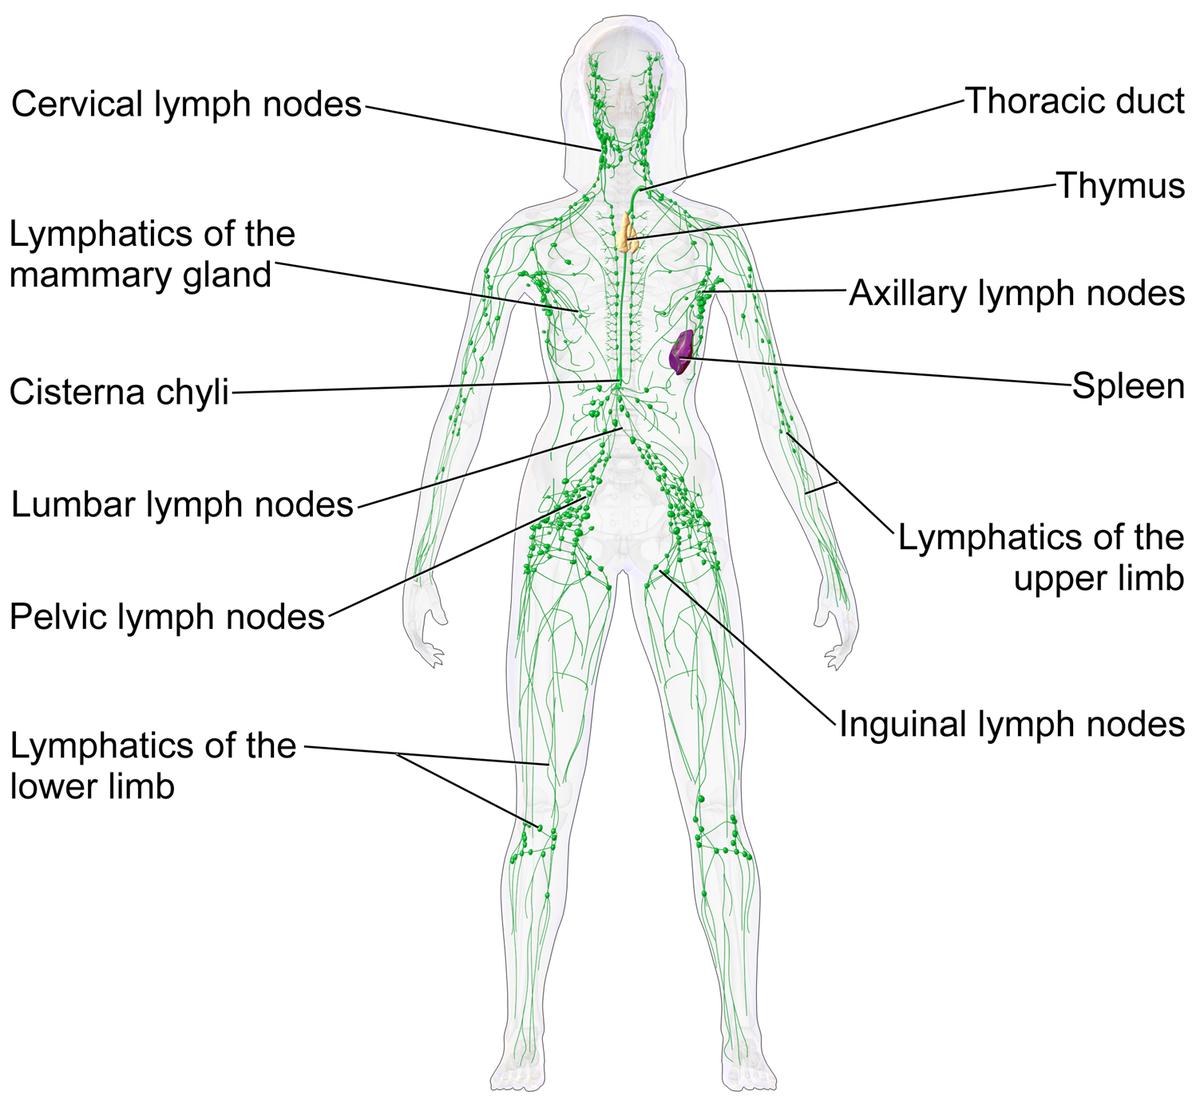 1200px-Blausen_0623_LymphaticSystem_Female.png